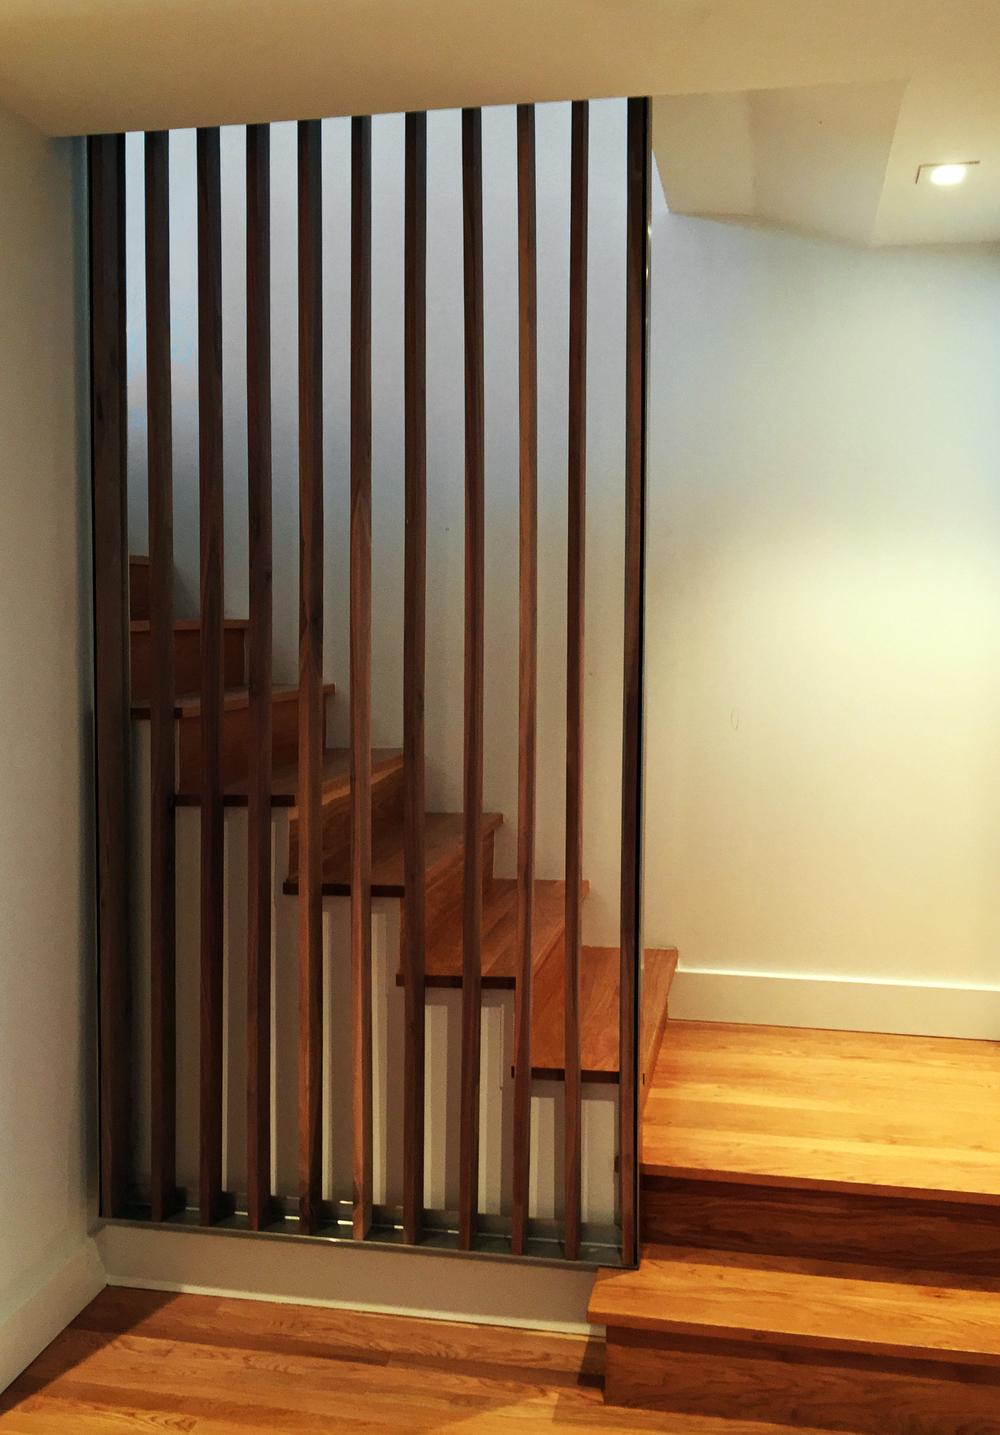 stair1 new copy.jpg